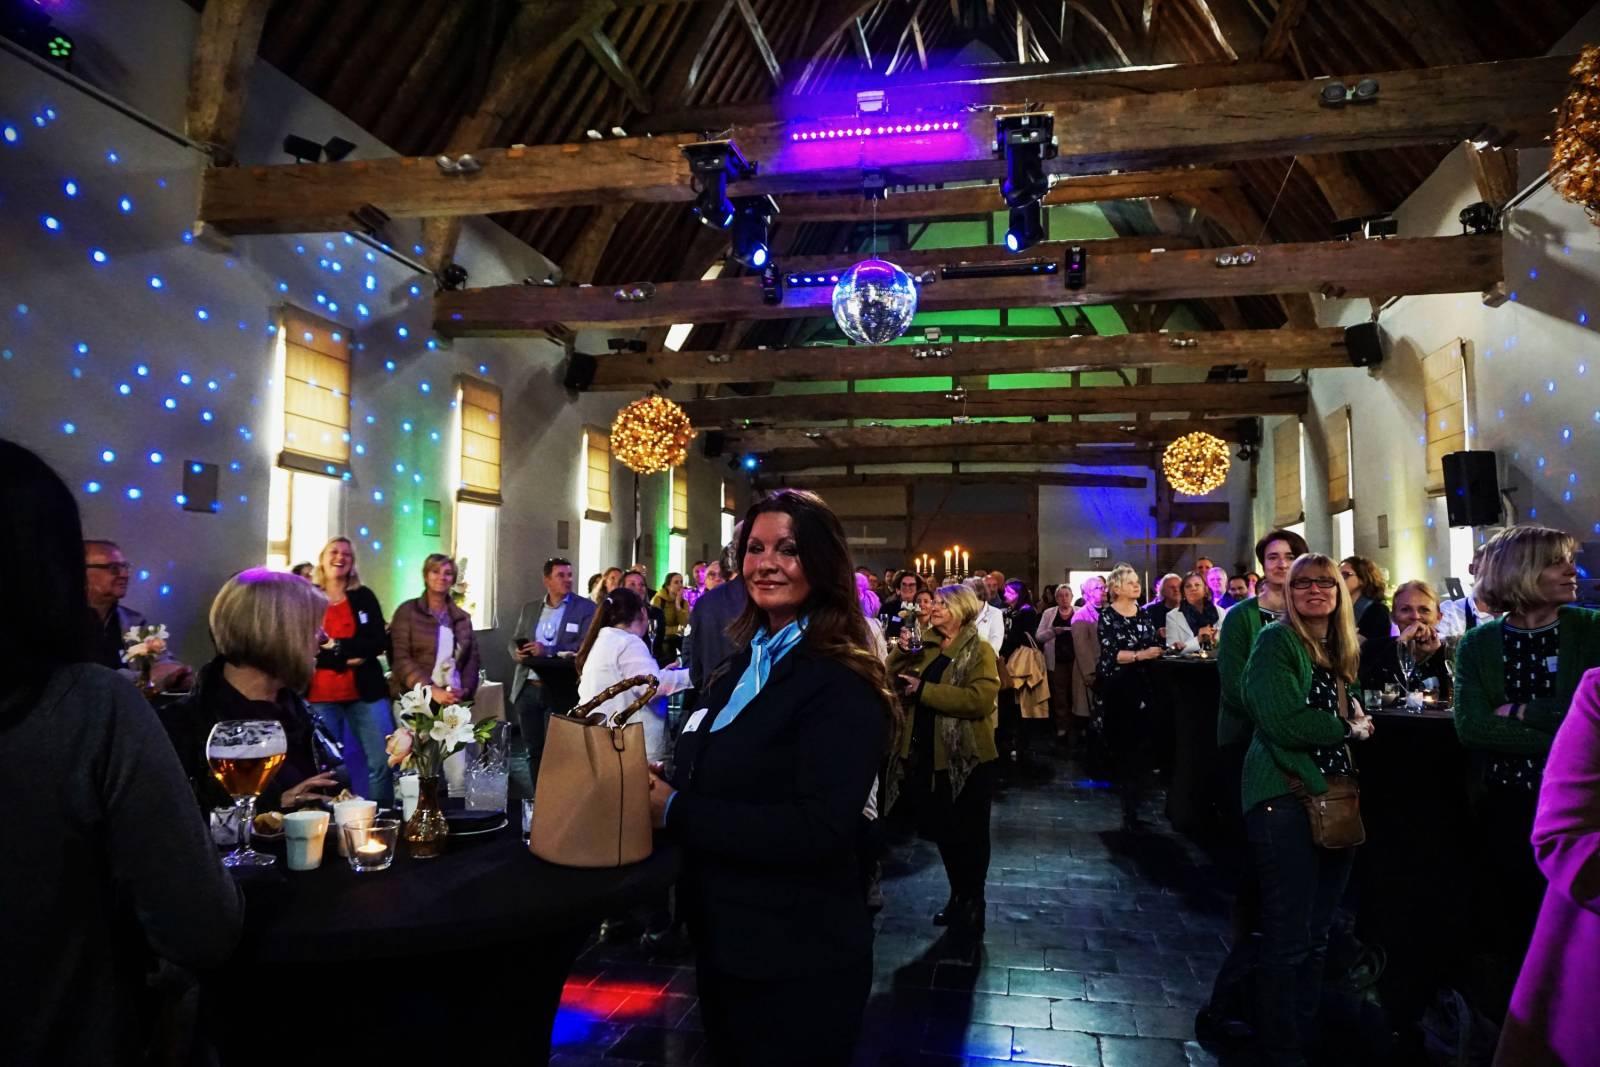 Faculty Club - Feestzaal te Leuven - Eventlocatie - GARDEN LOUNGE MEI 2019 - House of Events - 1